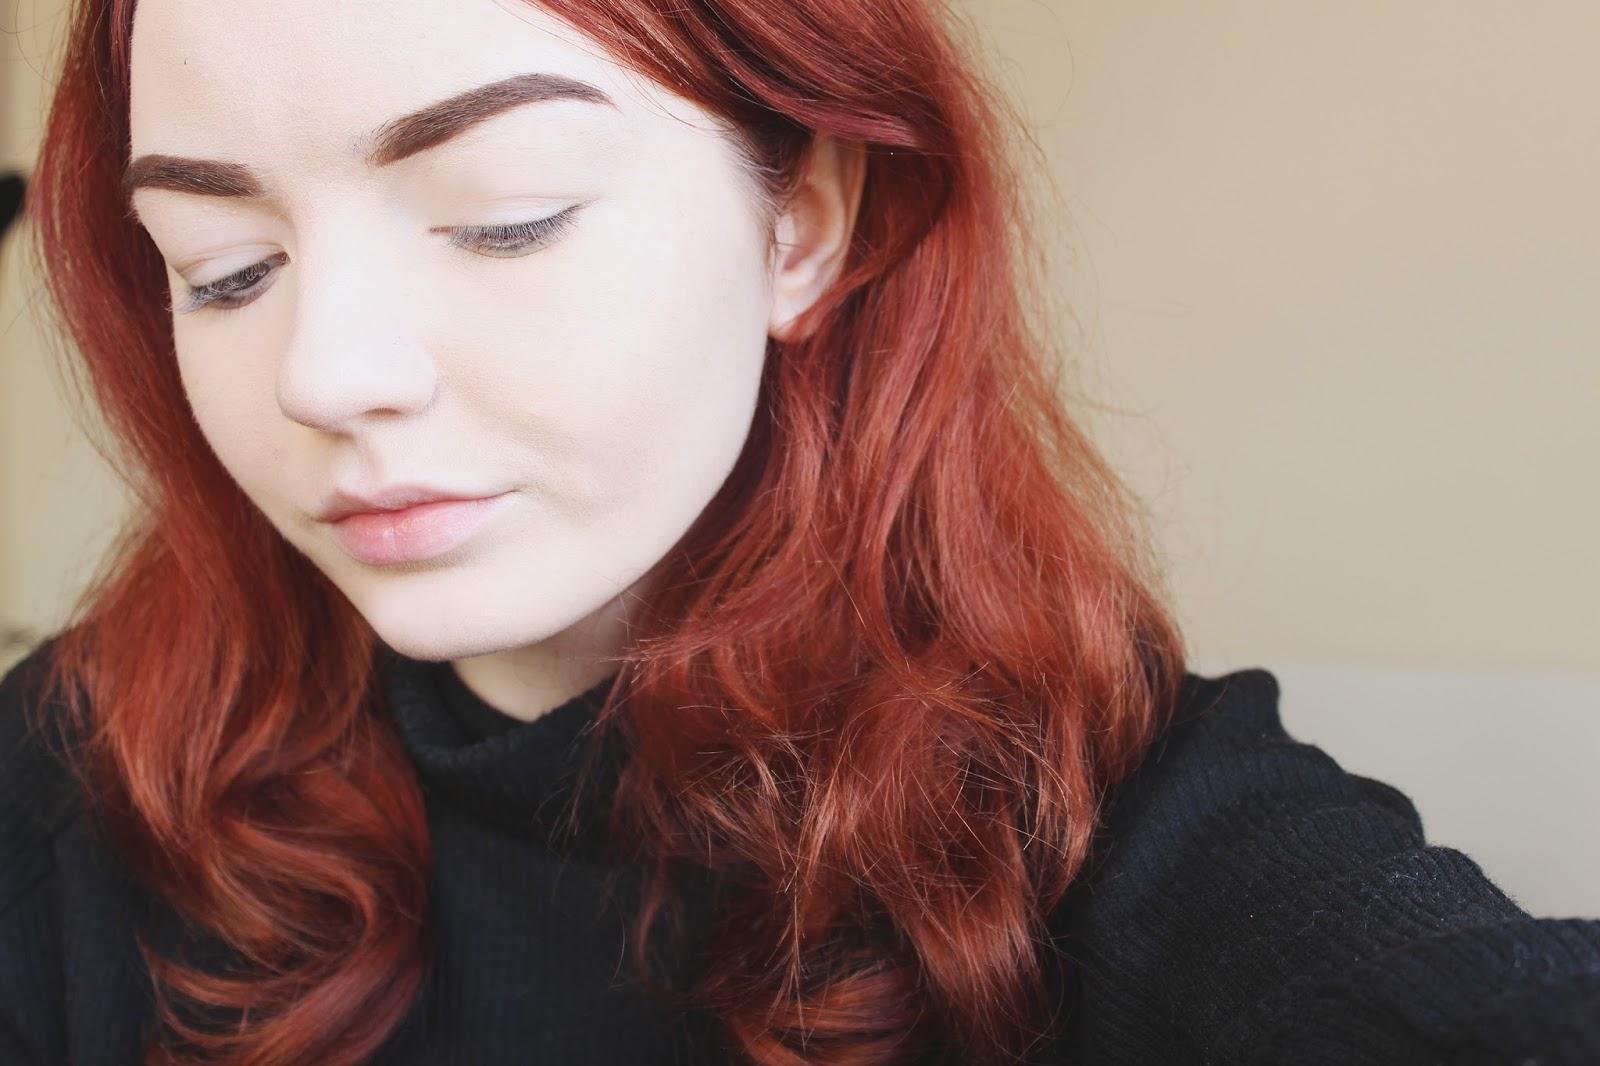 anastasia beverly hills dipbrow eyebrow tutorial